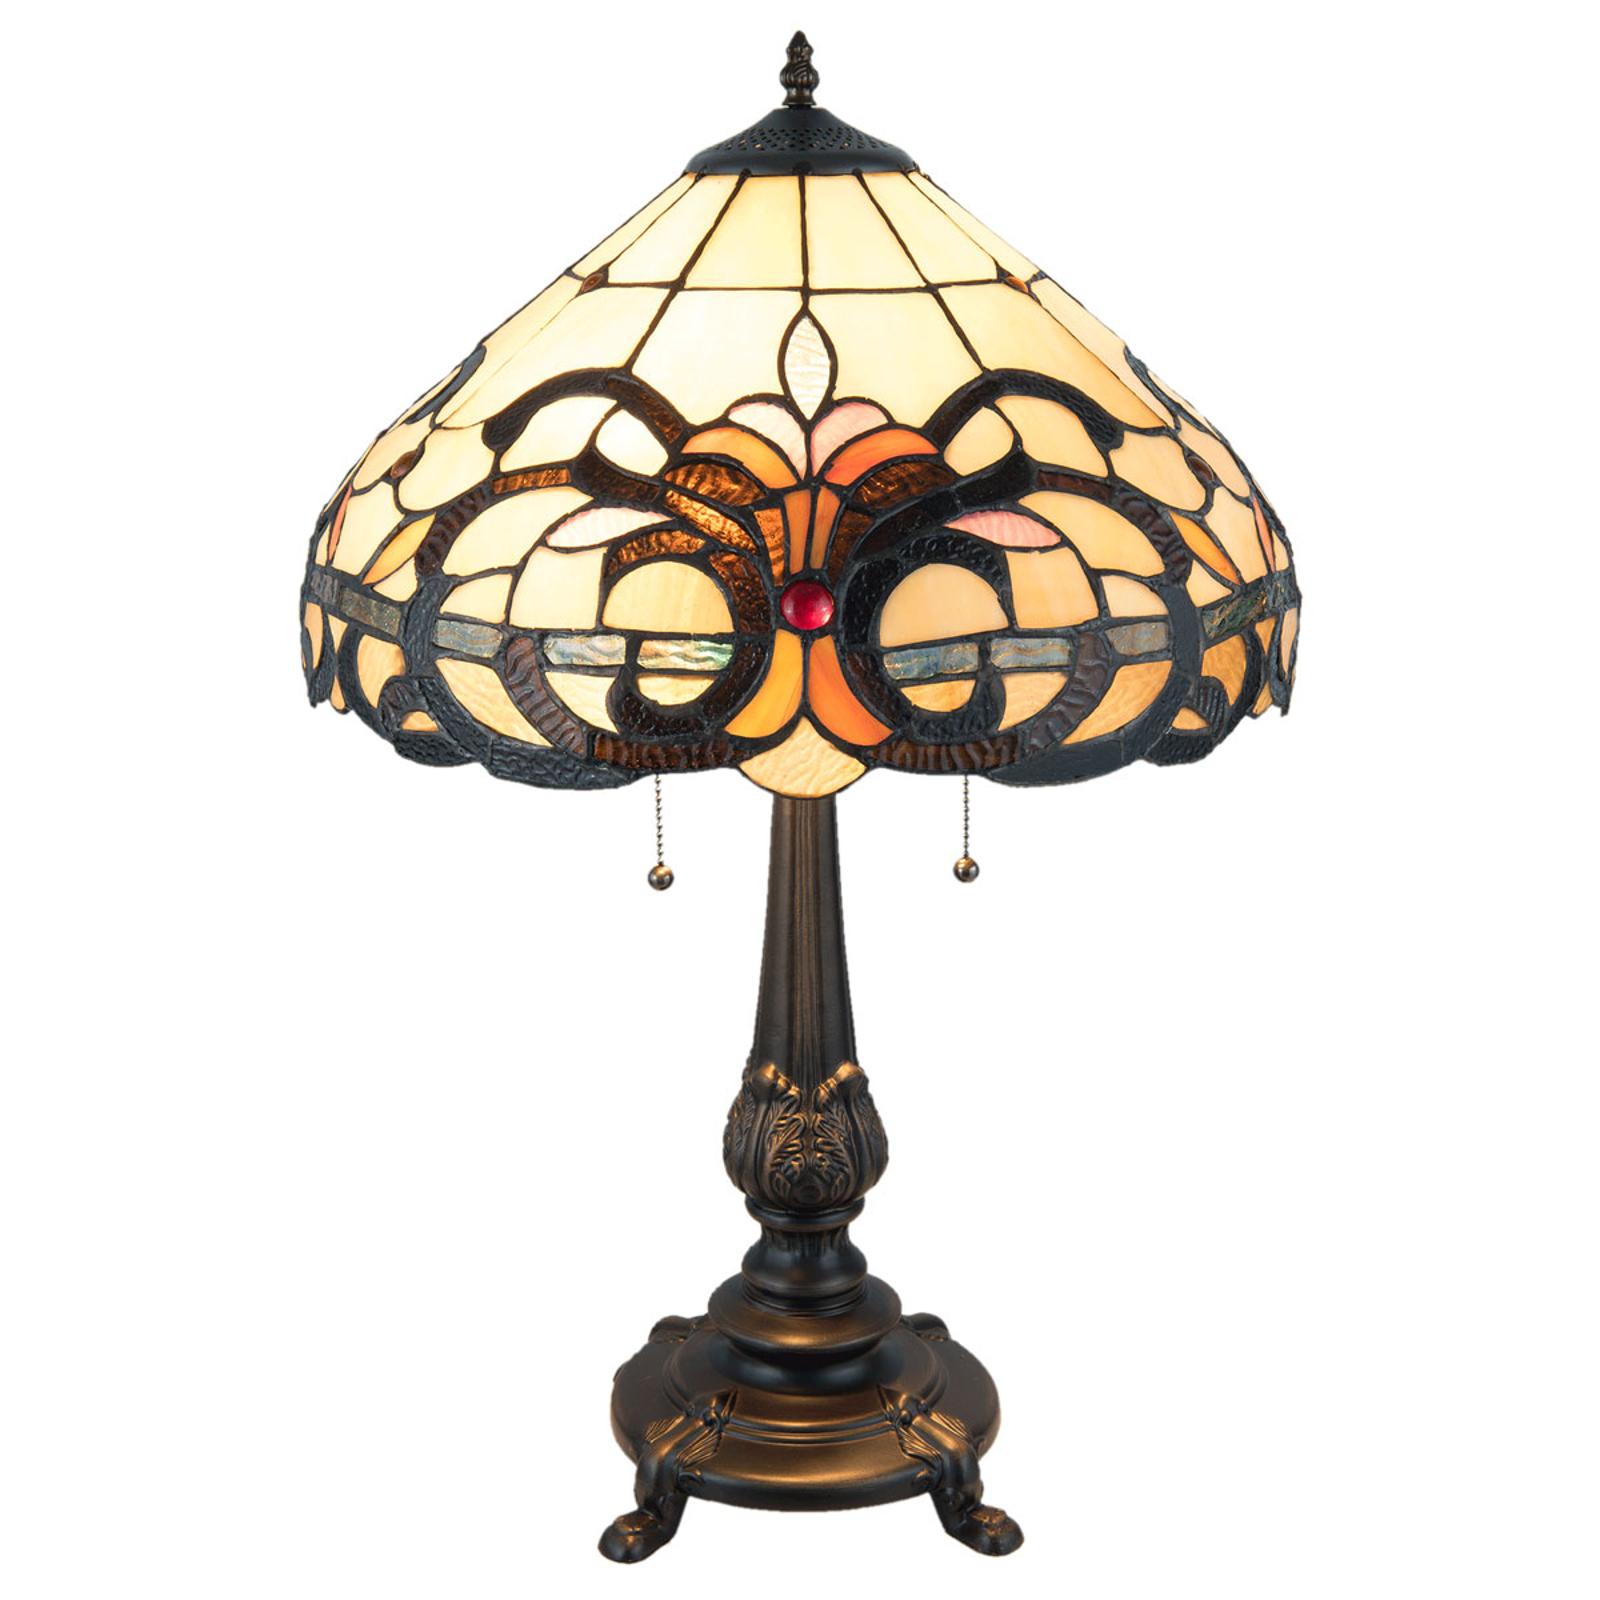 Tafellamp 5924 met glazen kap in Tiffany-stijl